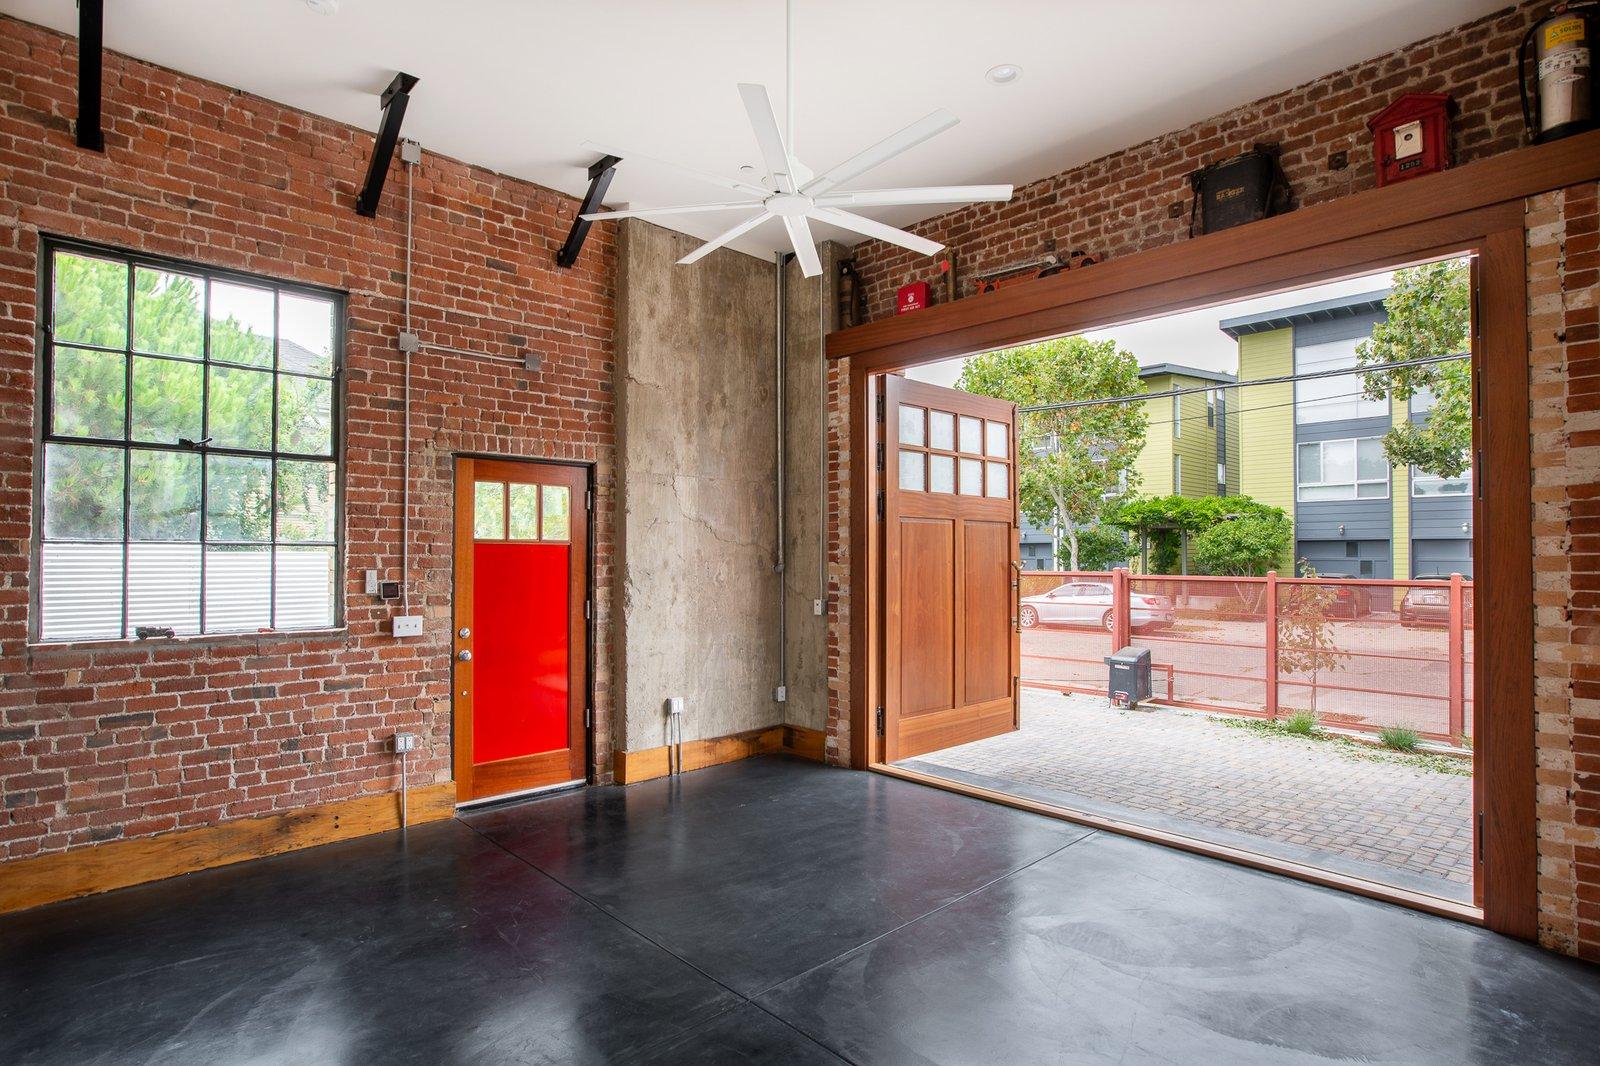 interior firehouse 1